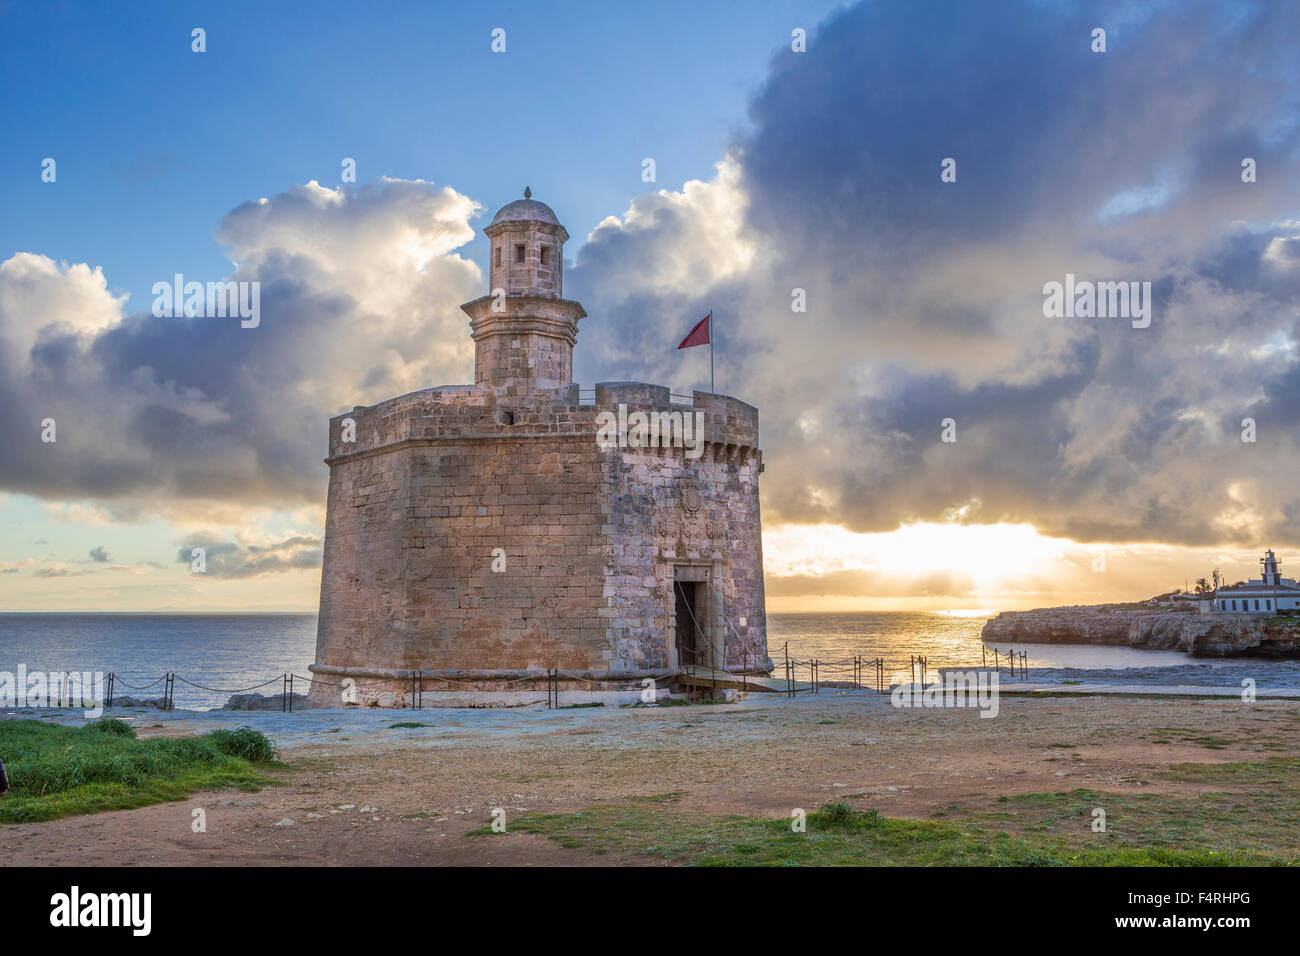 Balearic Islands, Ciutadella, town, Menorca, Island, Sant Nicolau, Spain, Europe, Spring, architecture, castle, - Stock Image